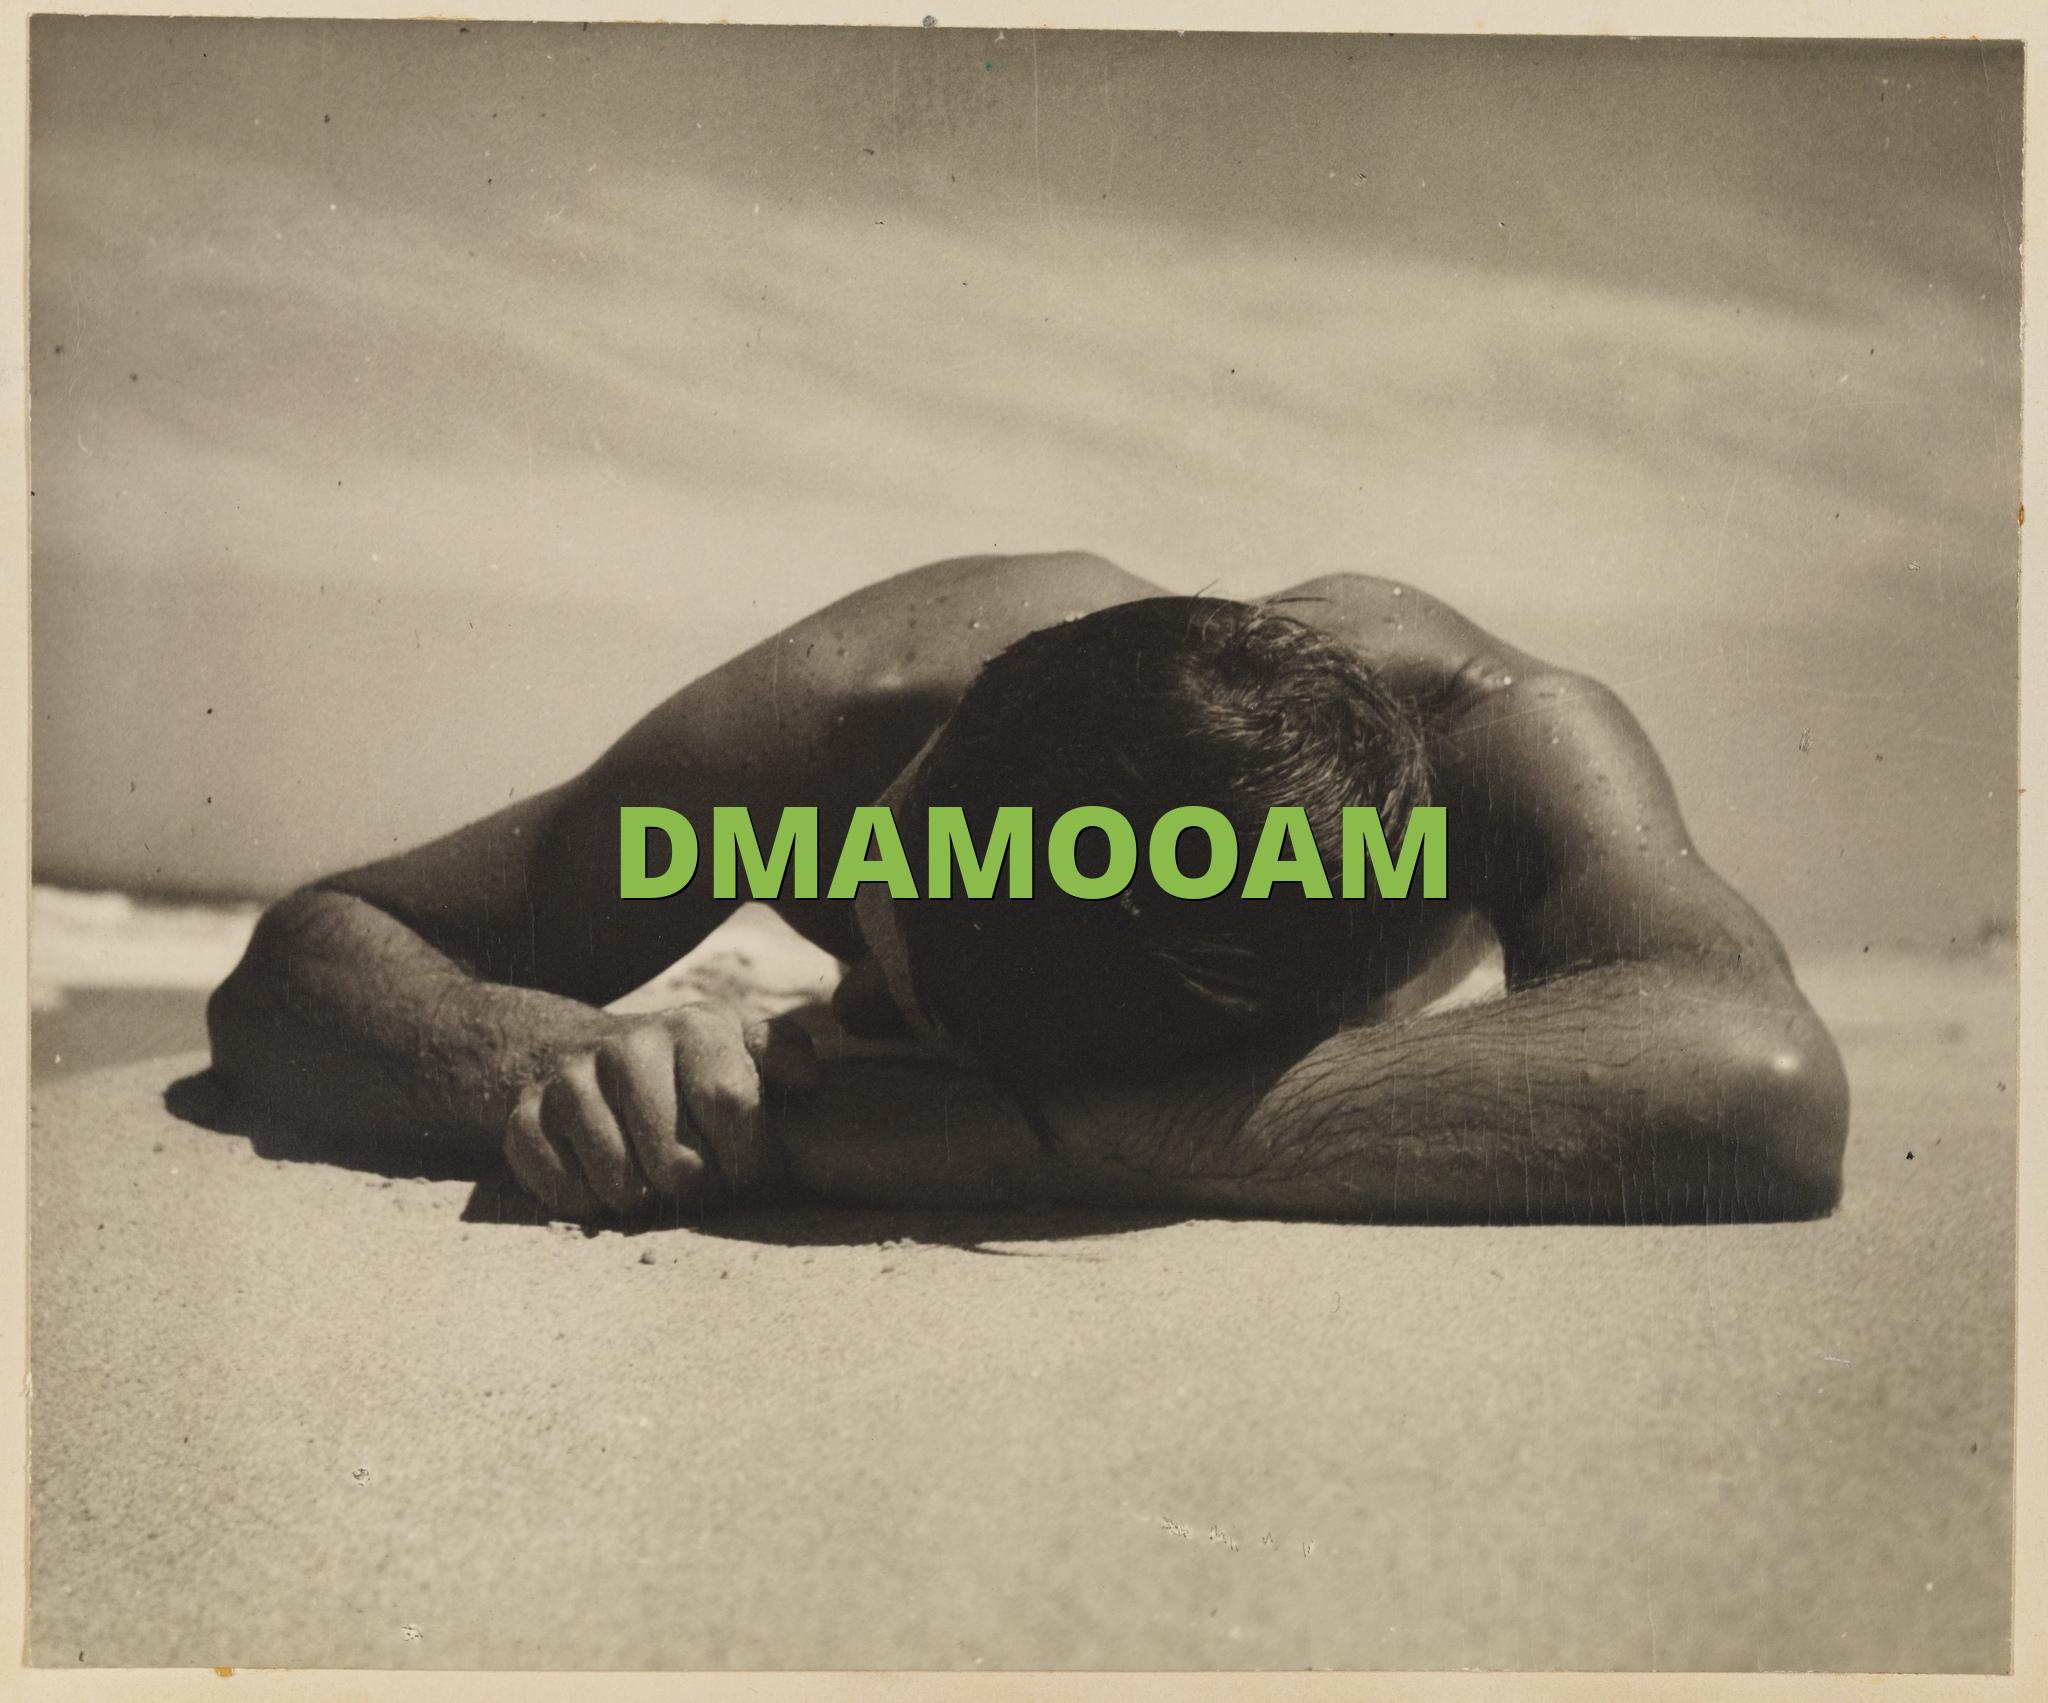 DMAMOOAM